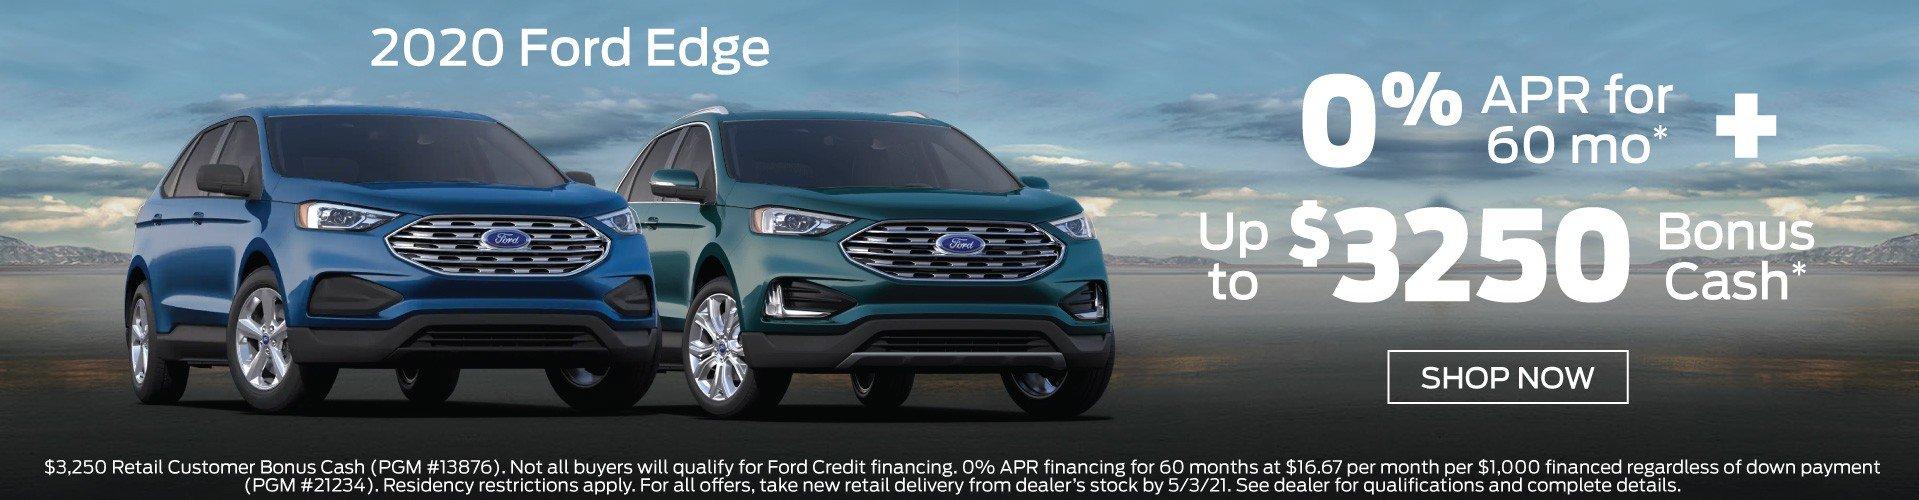 Ford Edge Incentive 5-3-2021